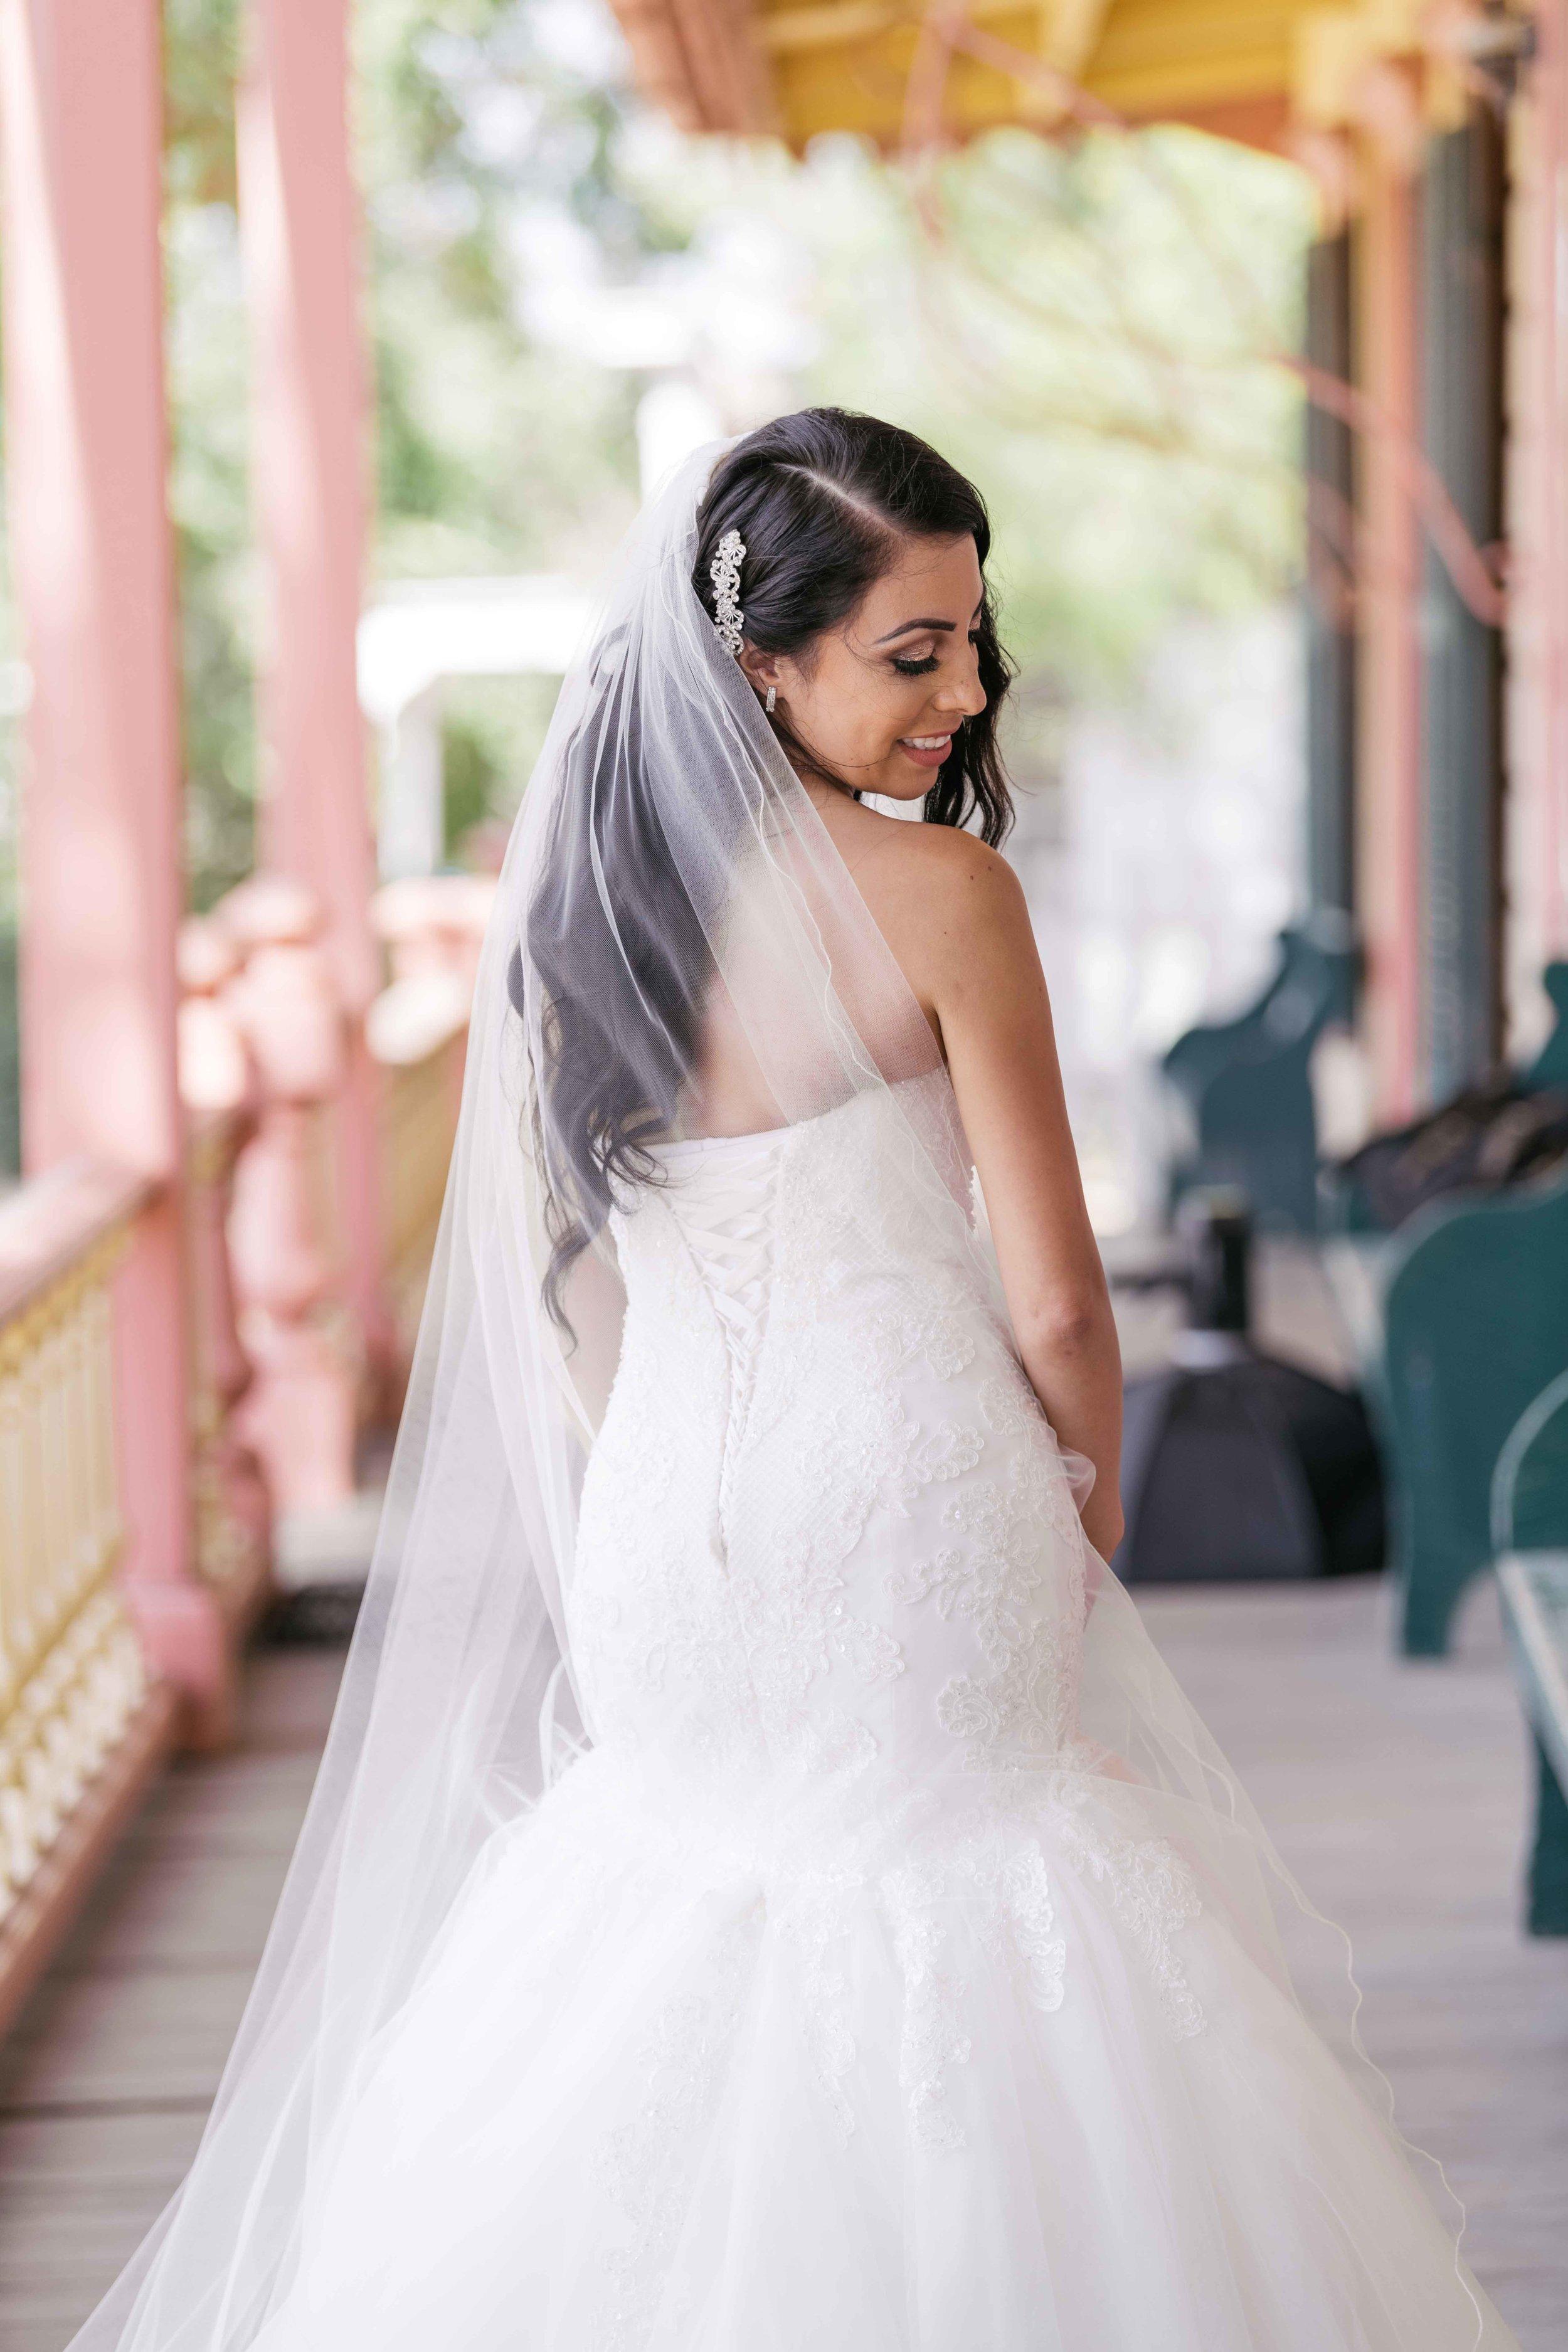 san-juan-bautista-photographer-tony-monse-wedding-429.JPG